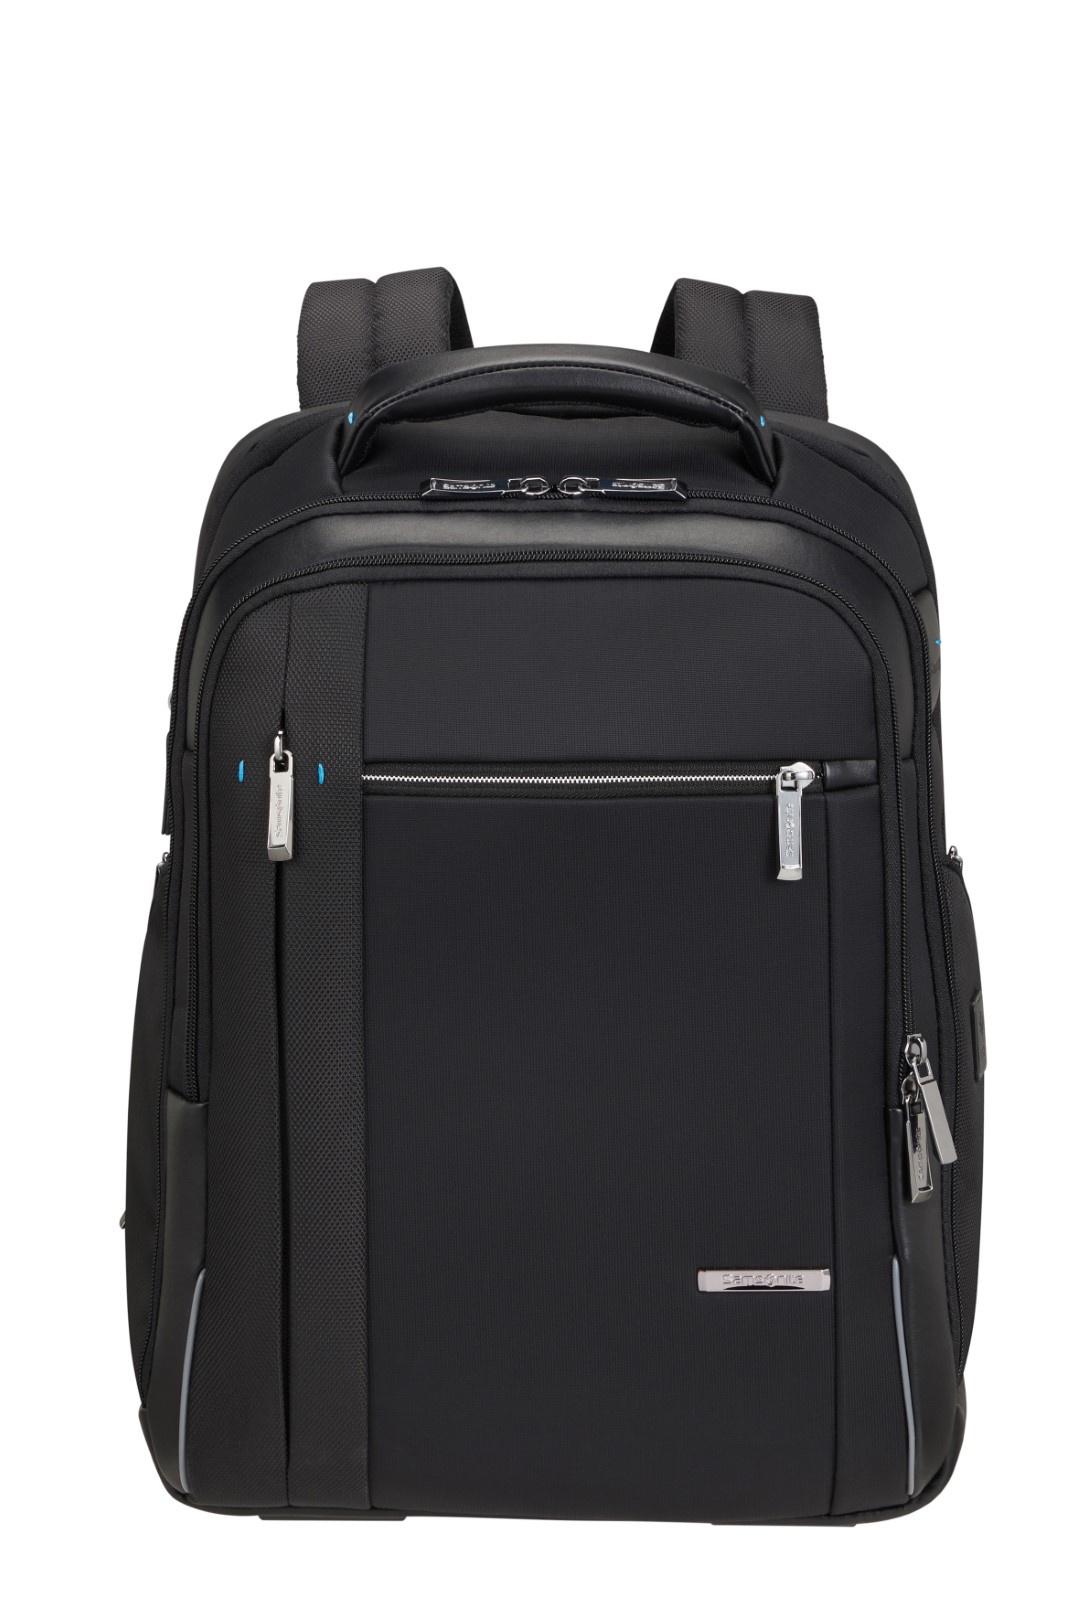 Samsonite Spectrolite 3.0 Laptop Backpack 15.6